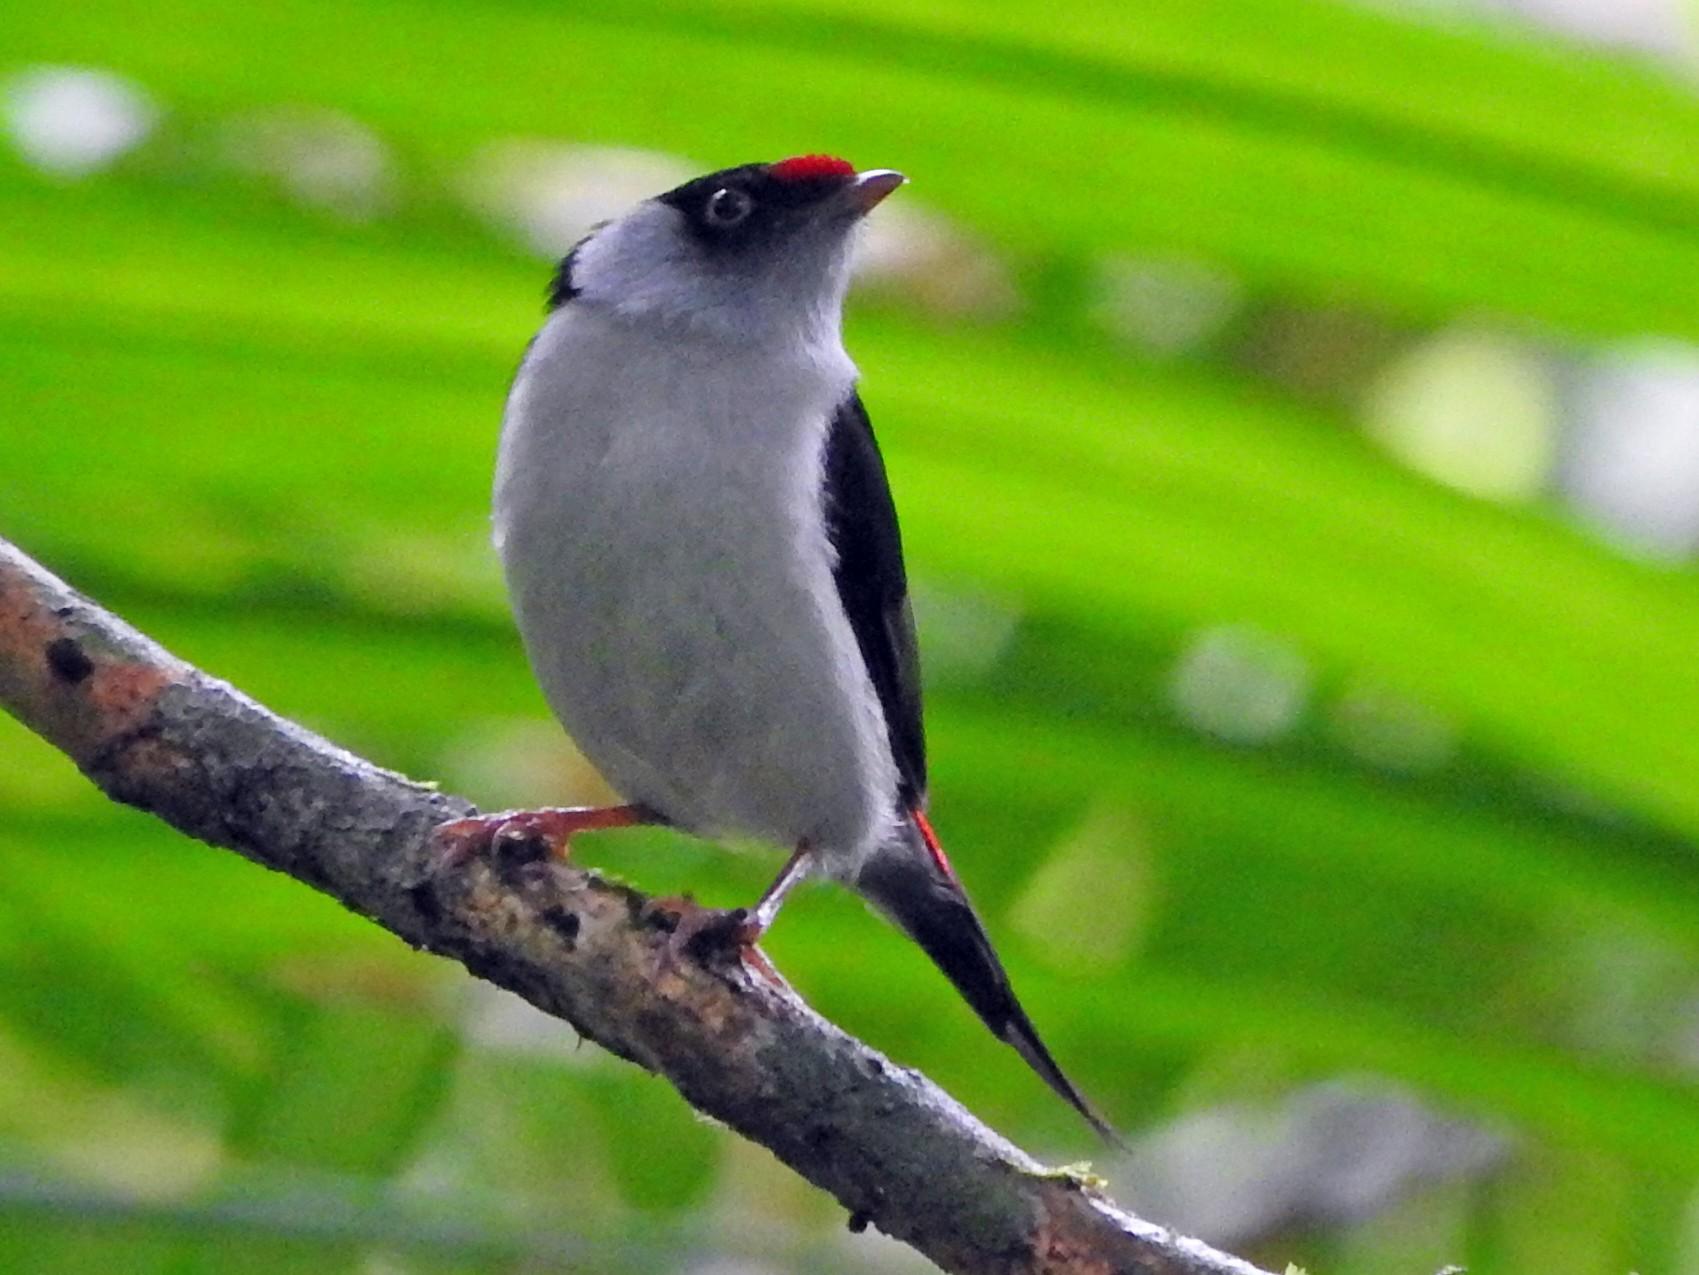 Pin-tailed Manakin - Juliano Gomes